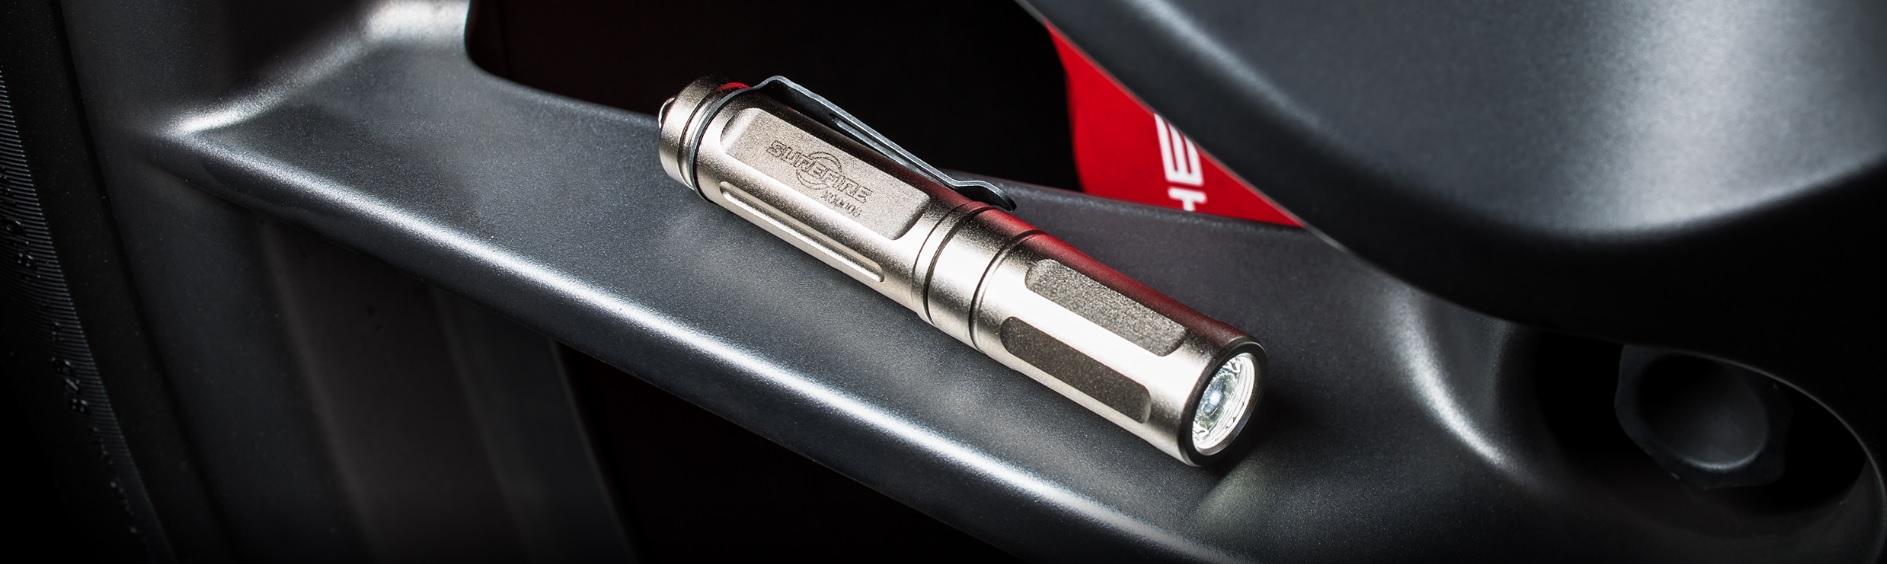 TITAN-B-SUREFIRE-TITAN-PLUS-Ultra-Compact-Multi-Output-LED-Keychain-Light-TITAN-B-BANNER